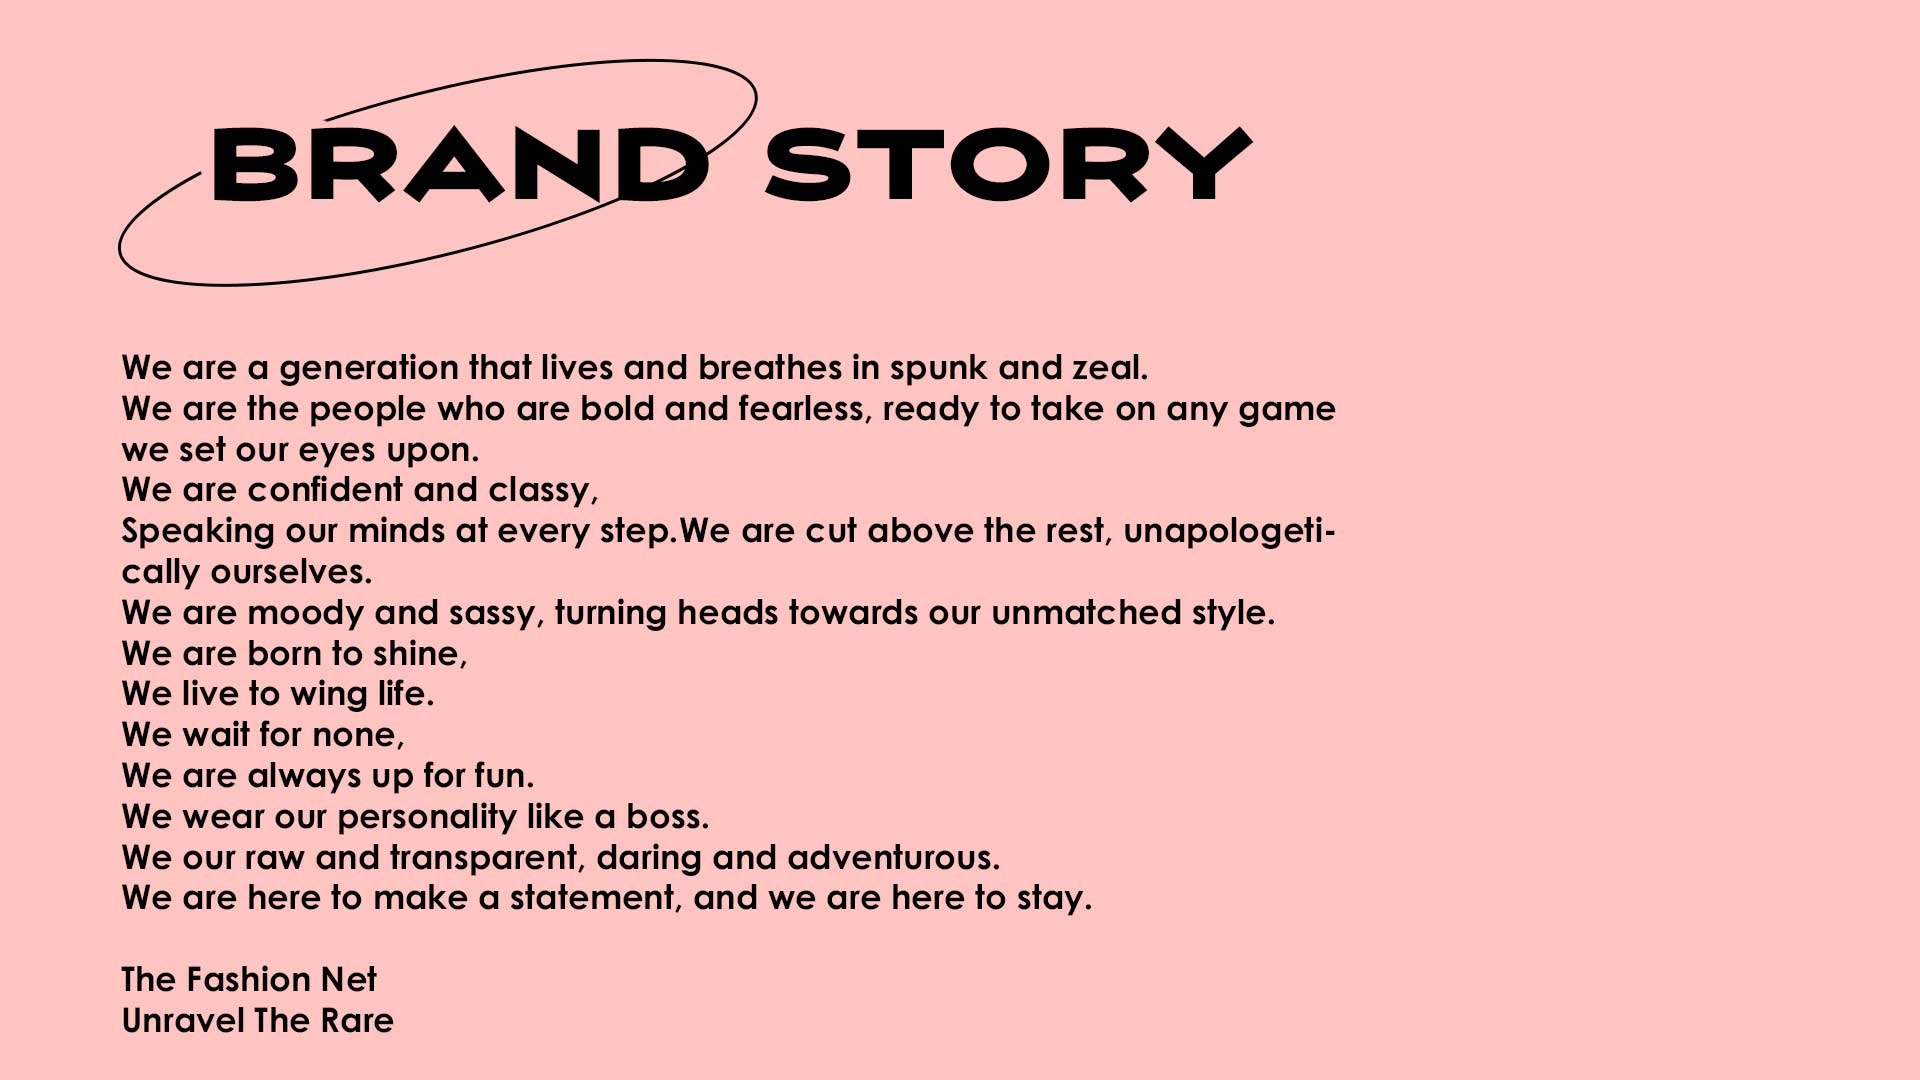 The Fashion Net Brand Story